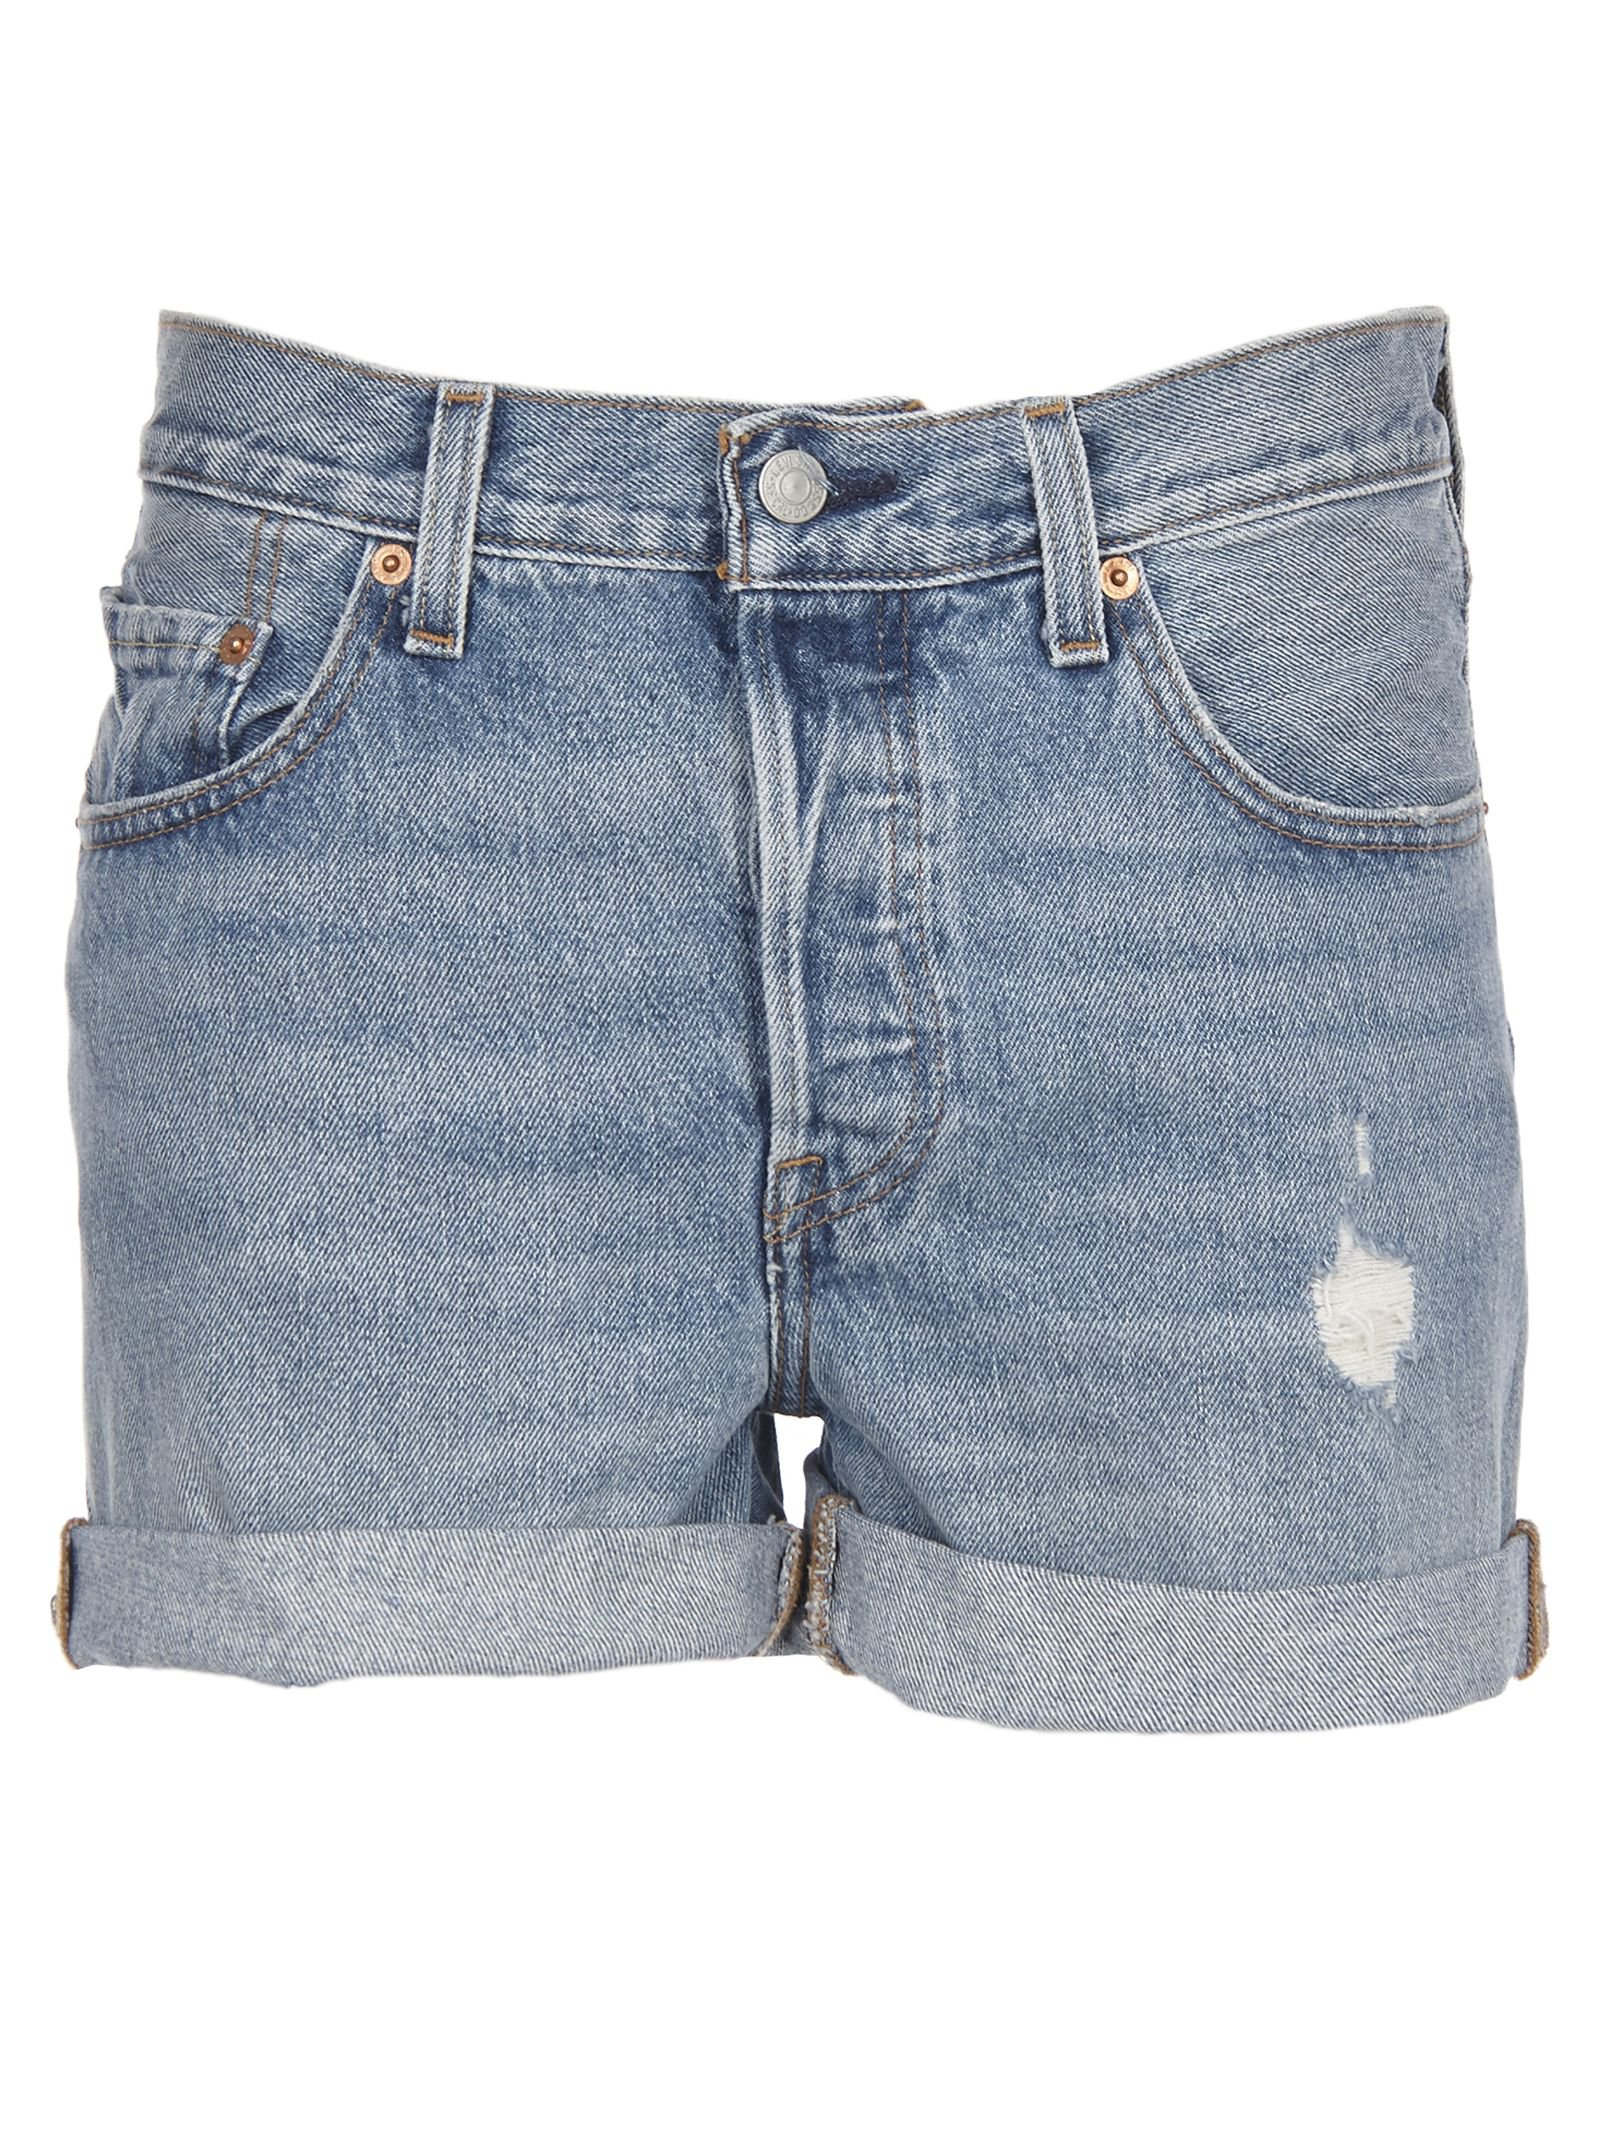 Levis Distressed Denim Shorts